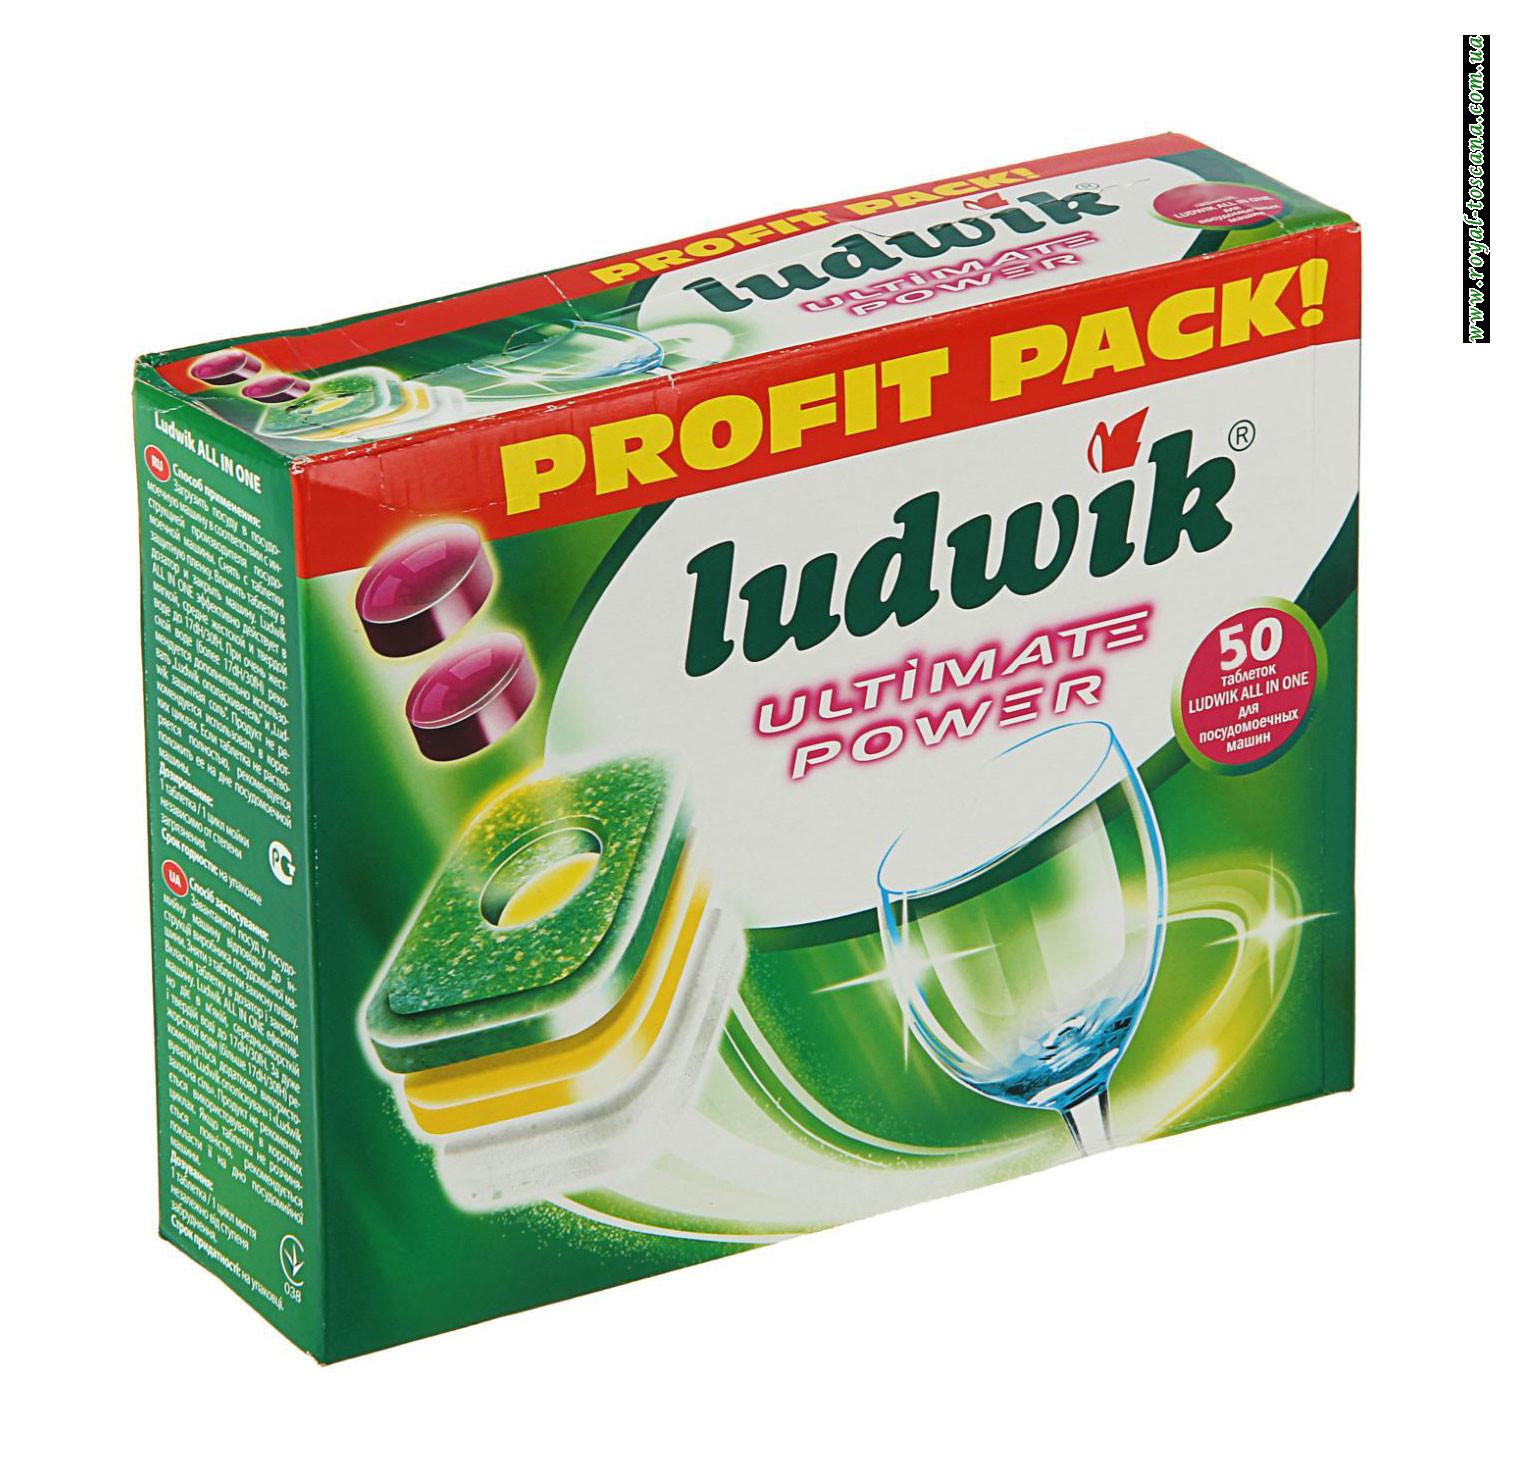 Таблетки для посудомоечных машин Ludwik Ultimate Power All in One, 50 шт